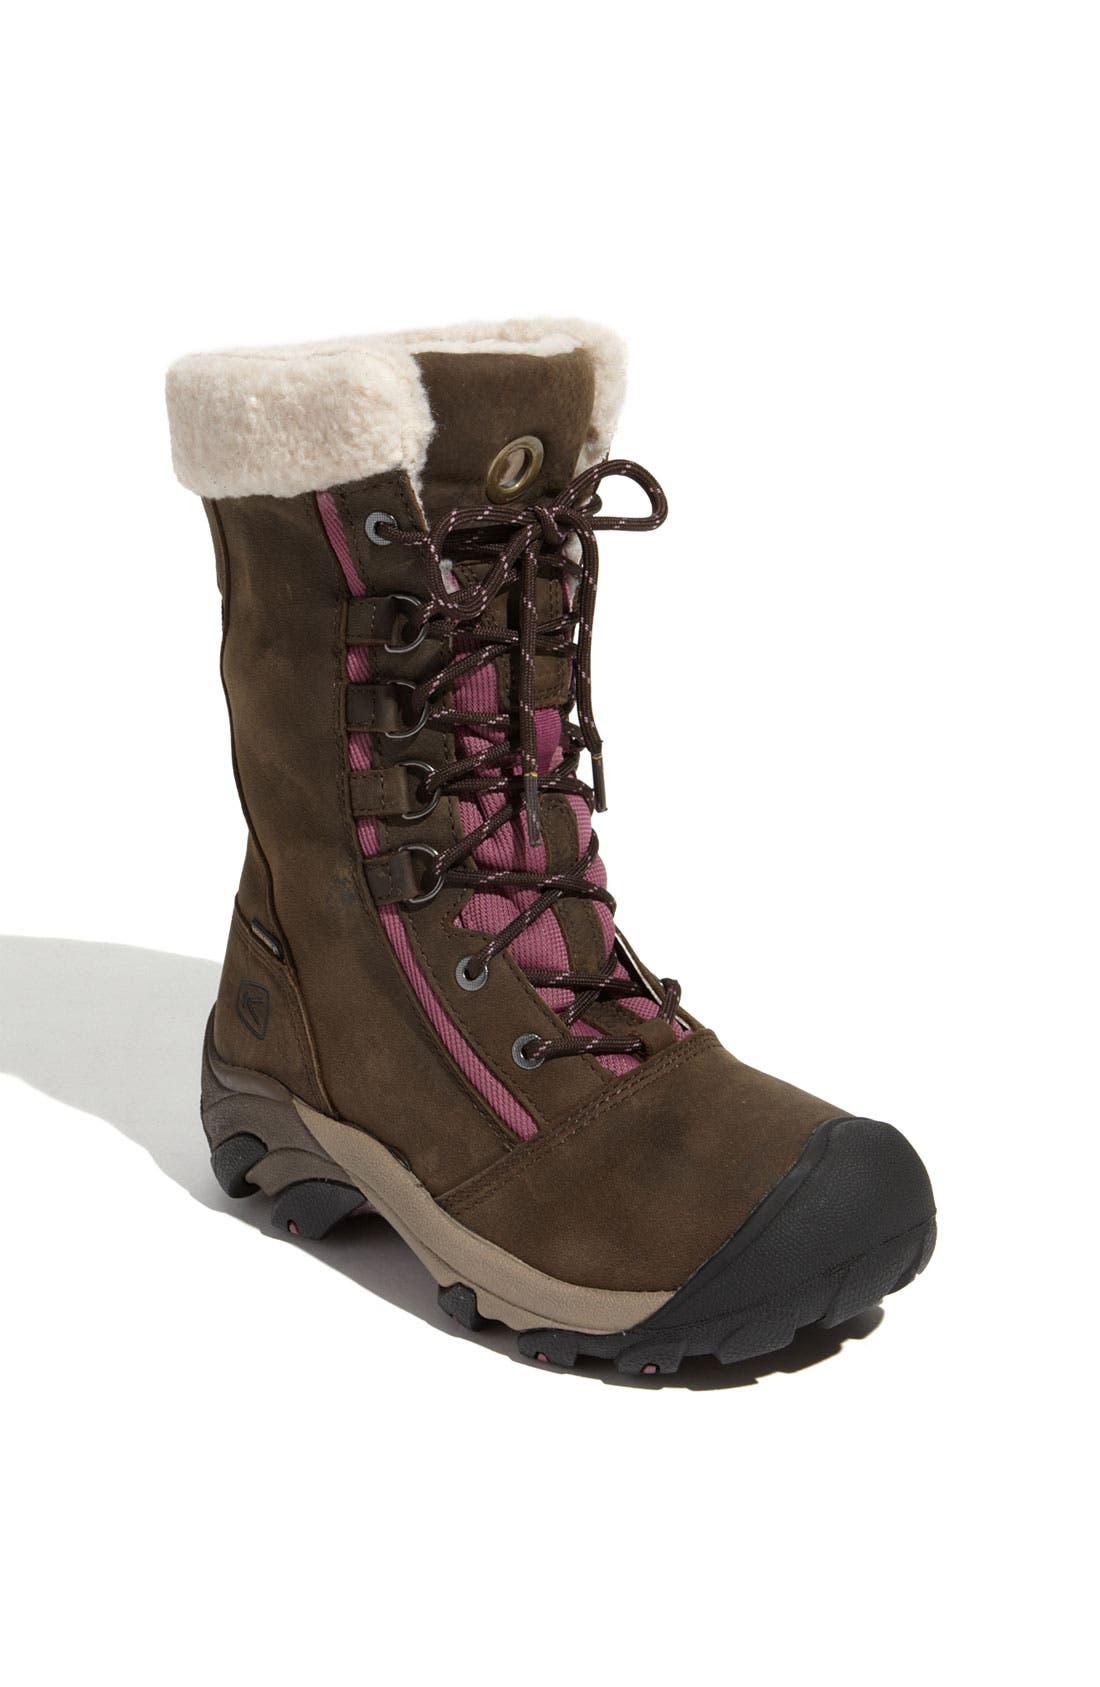 Main Image - Keen 'Hoodoo' Waterproof Nubuck Leather Boot